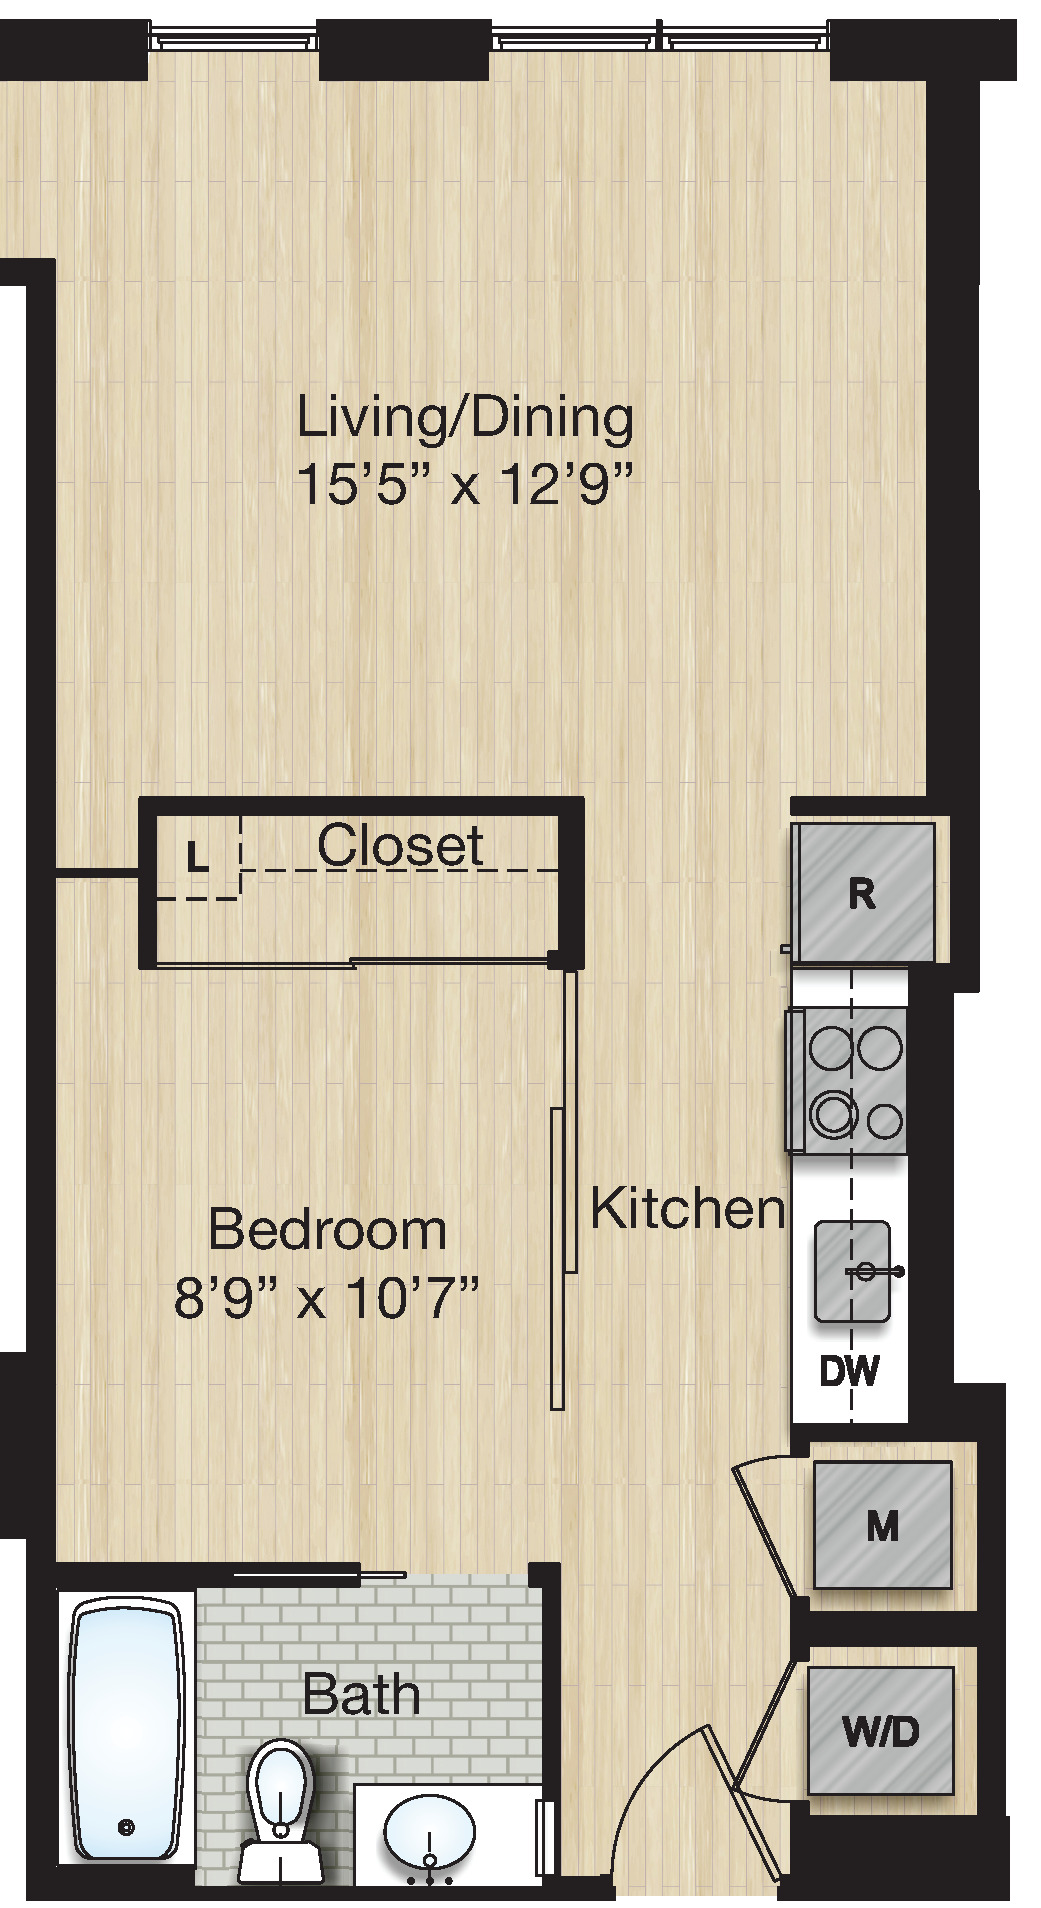 Apartment 0615 floorplan